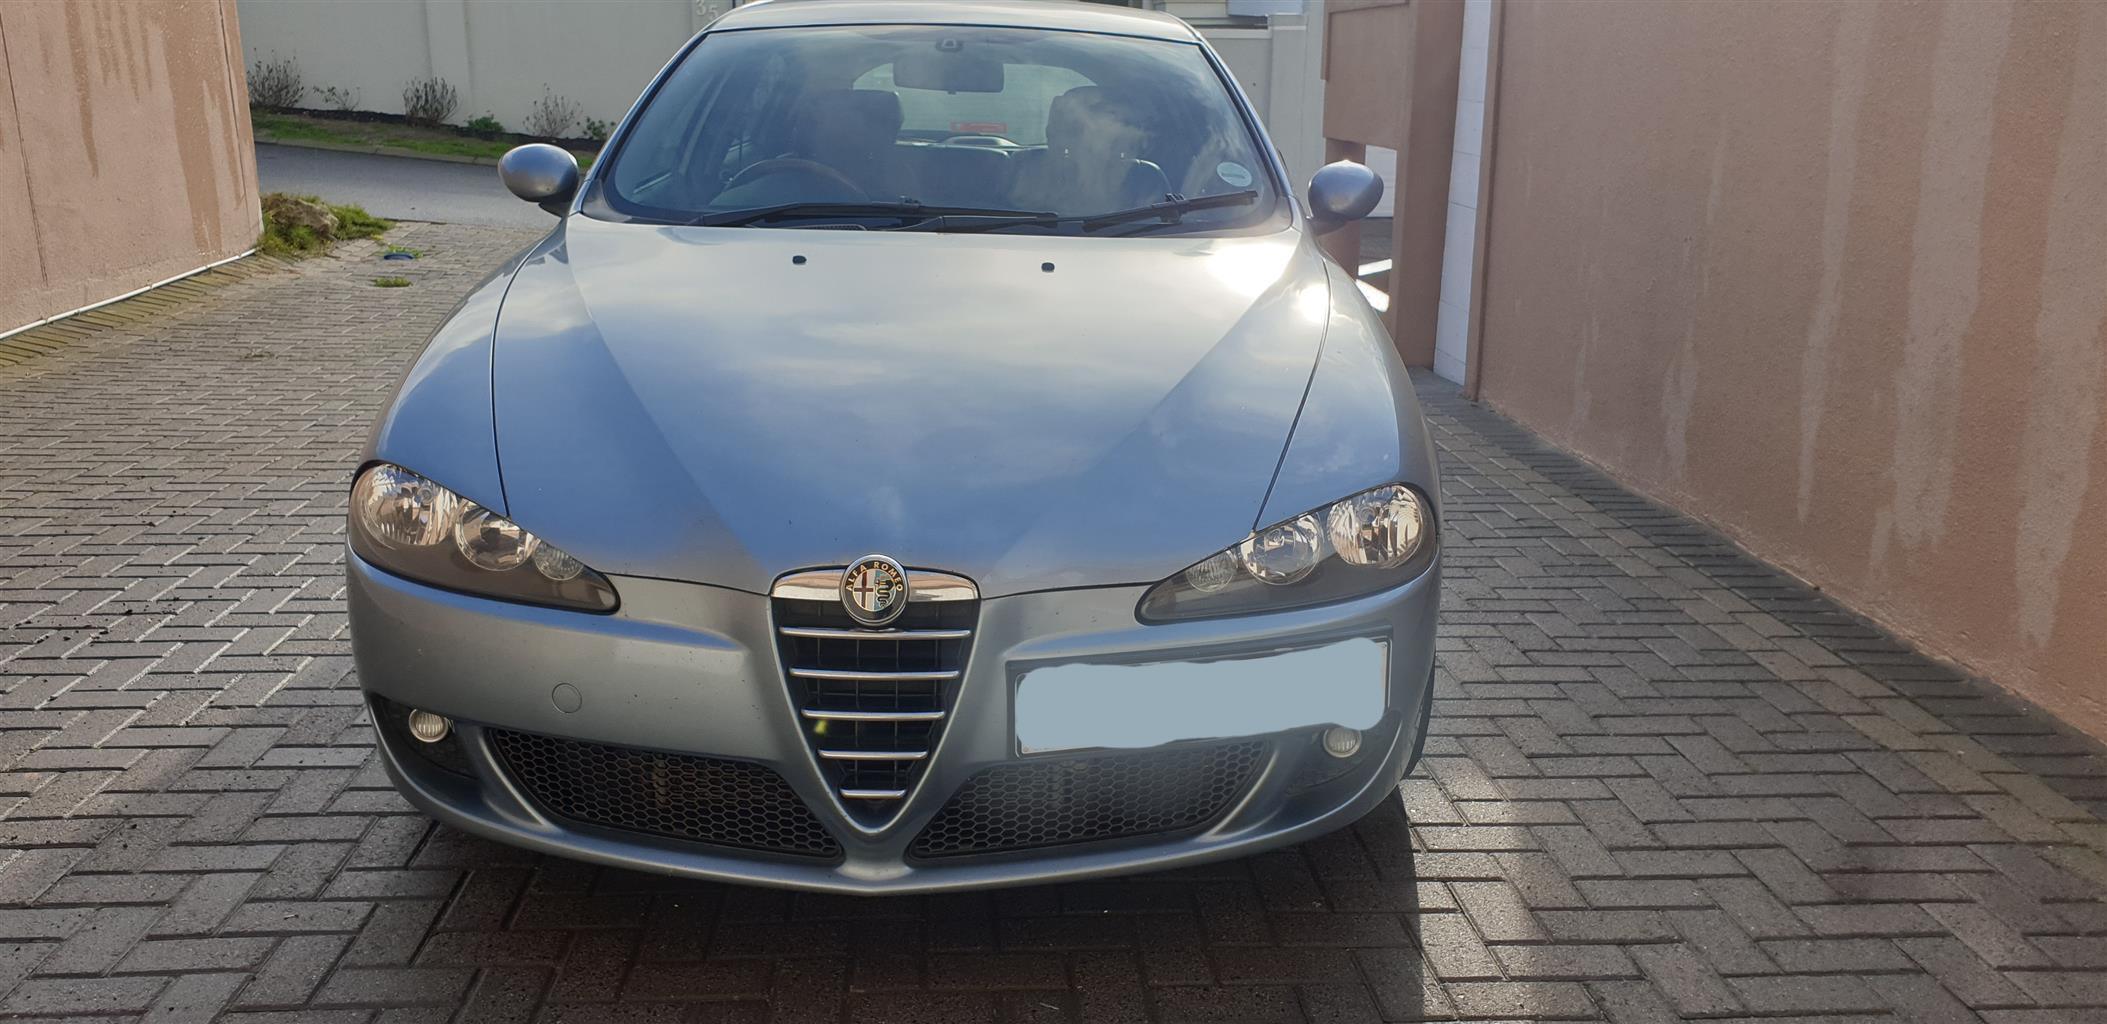 2006 Alfa Romeo 147 1 9 Jtd Multijet 5 Door Distinctive Junk Mail